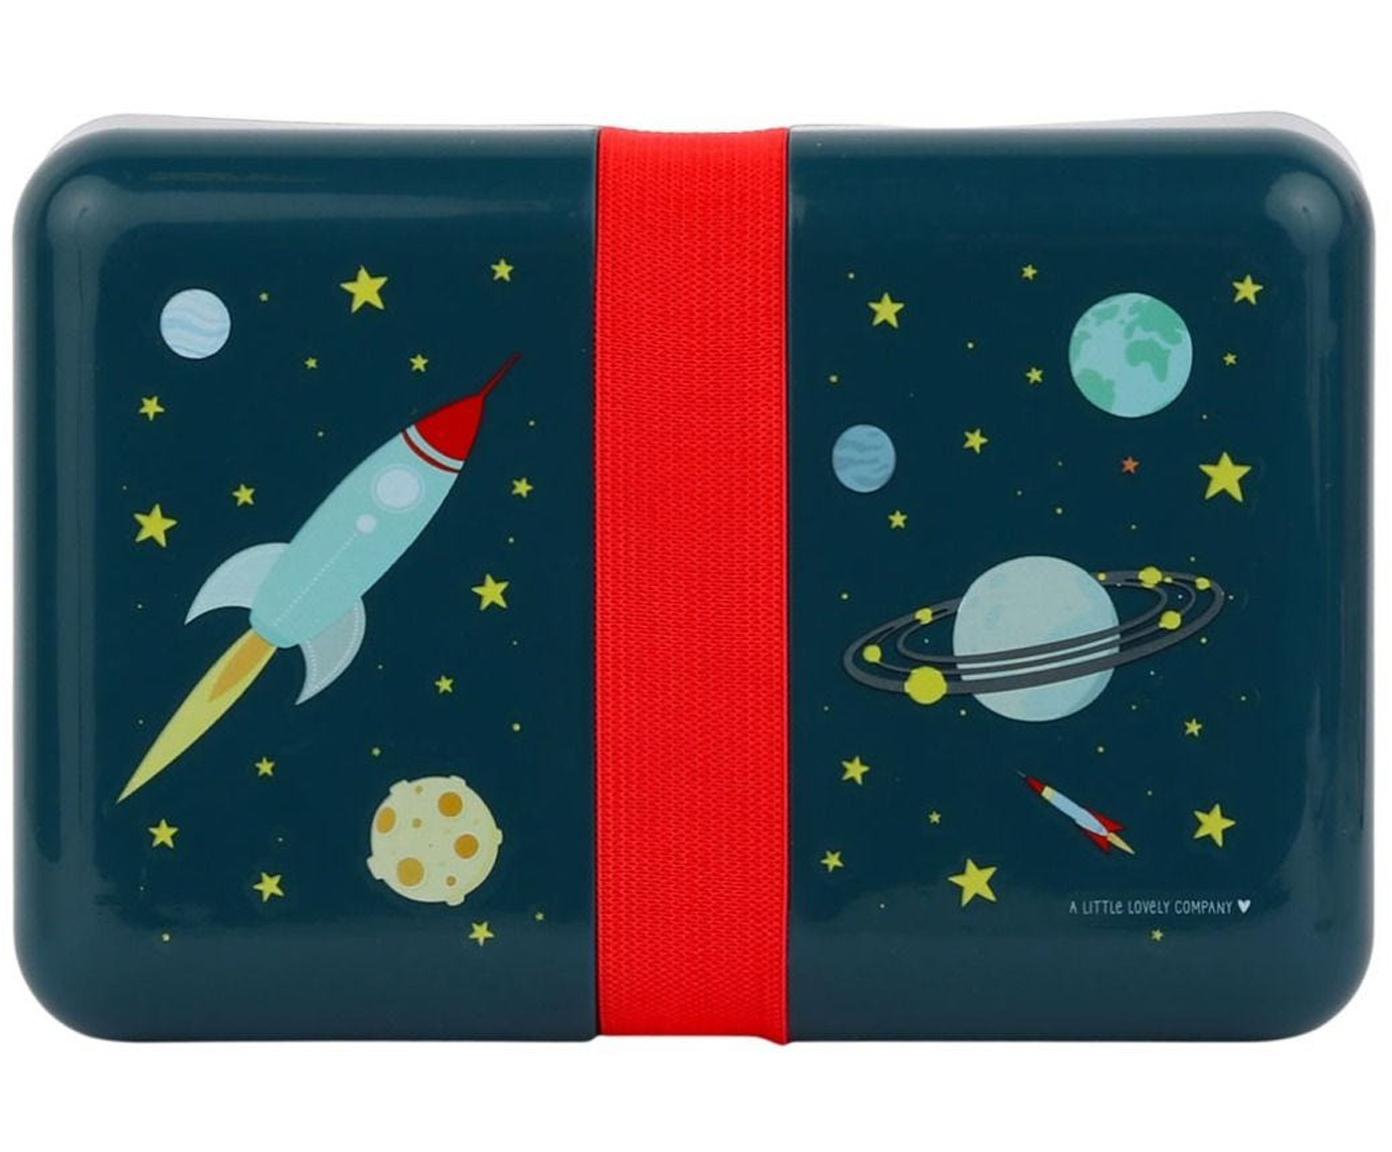 Lunchtrommel Space, Kunststof, Blauw, rood, 12 x 6 cm